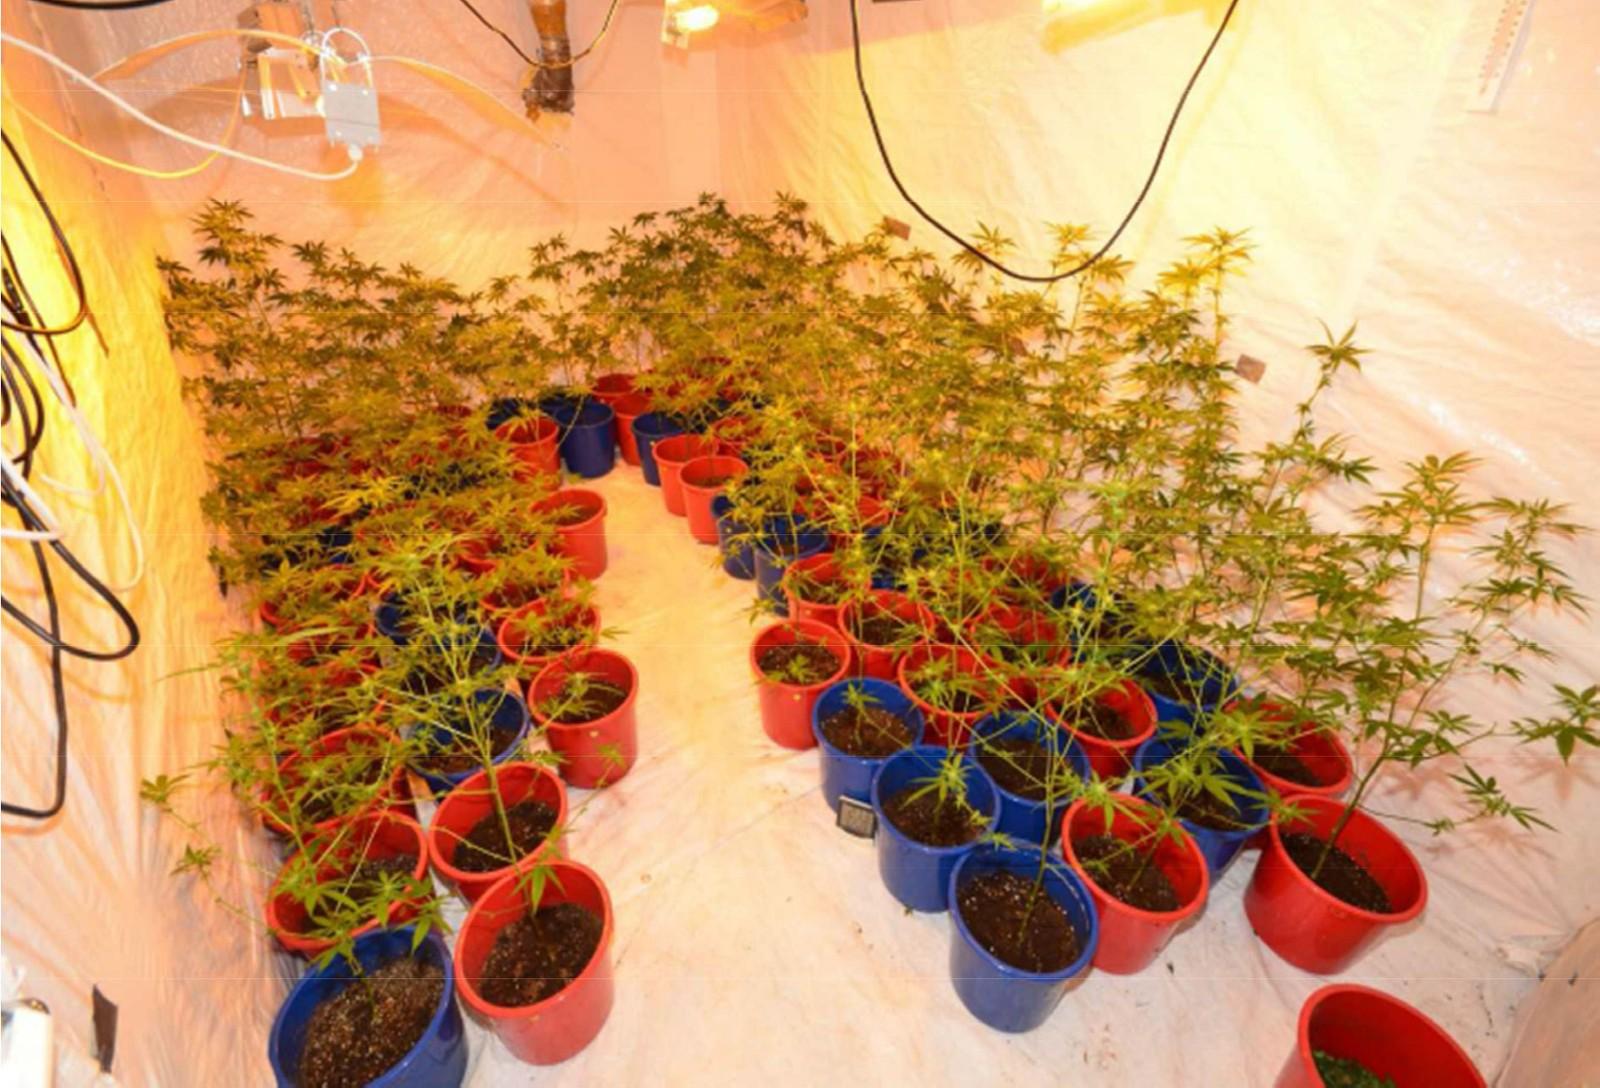 Hasjplanter i bolig